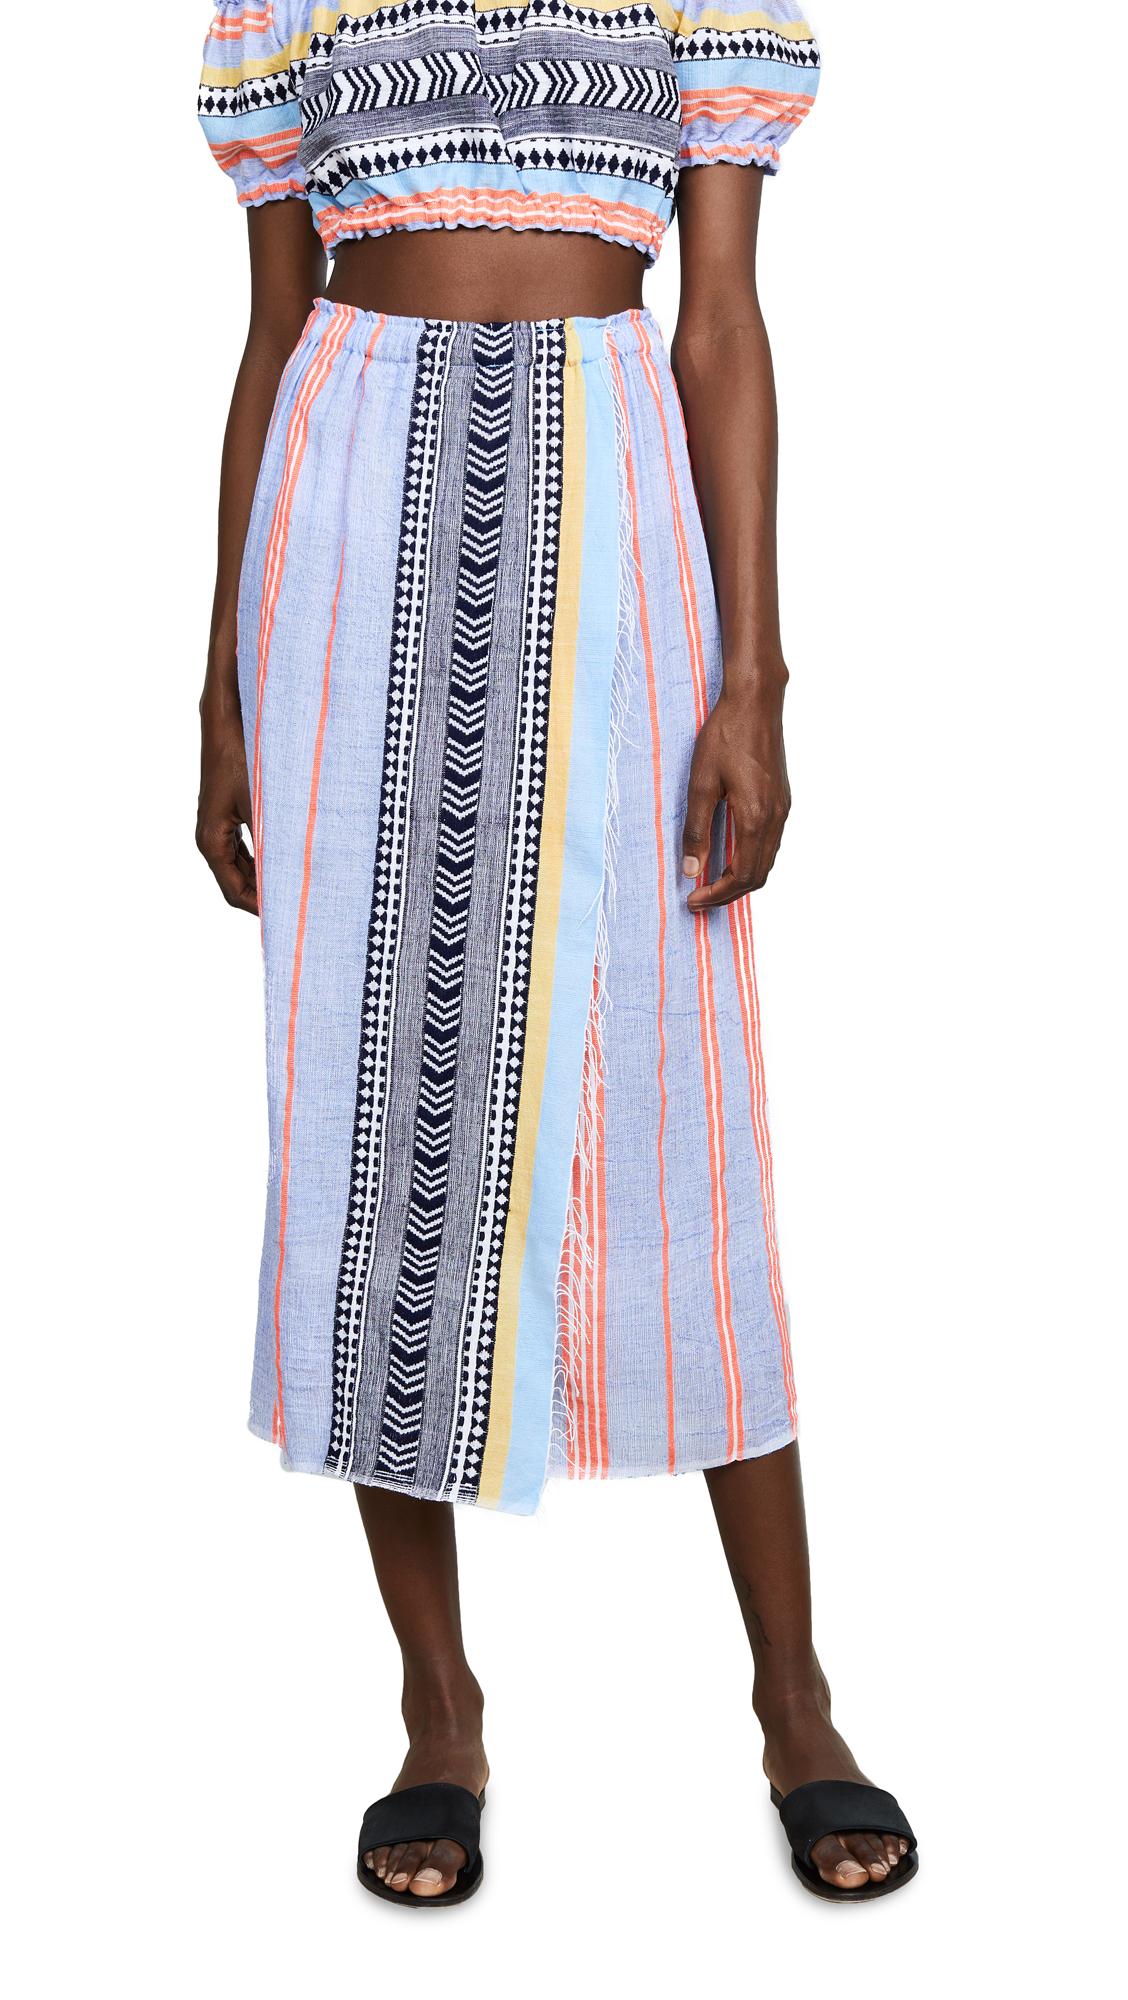 LEMLEM Sophia Folkloric & Striped Cotton-Blend Wrap Skirt Size S in Blue